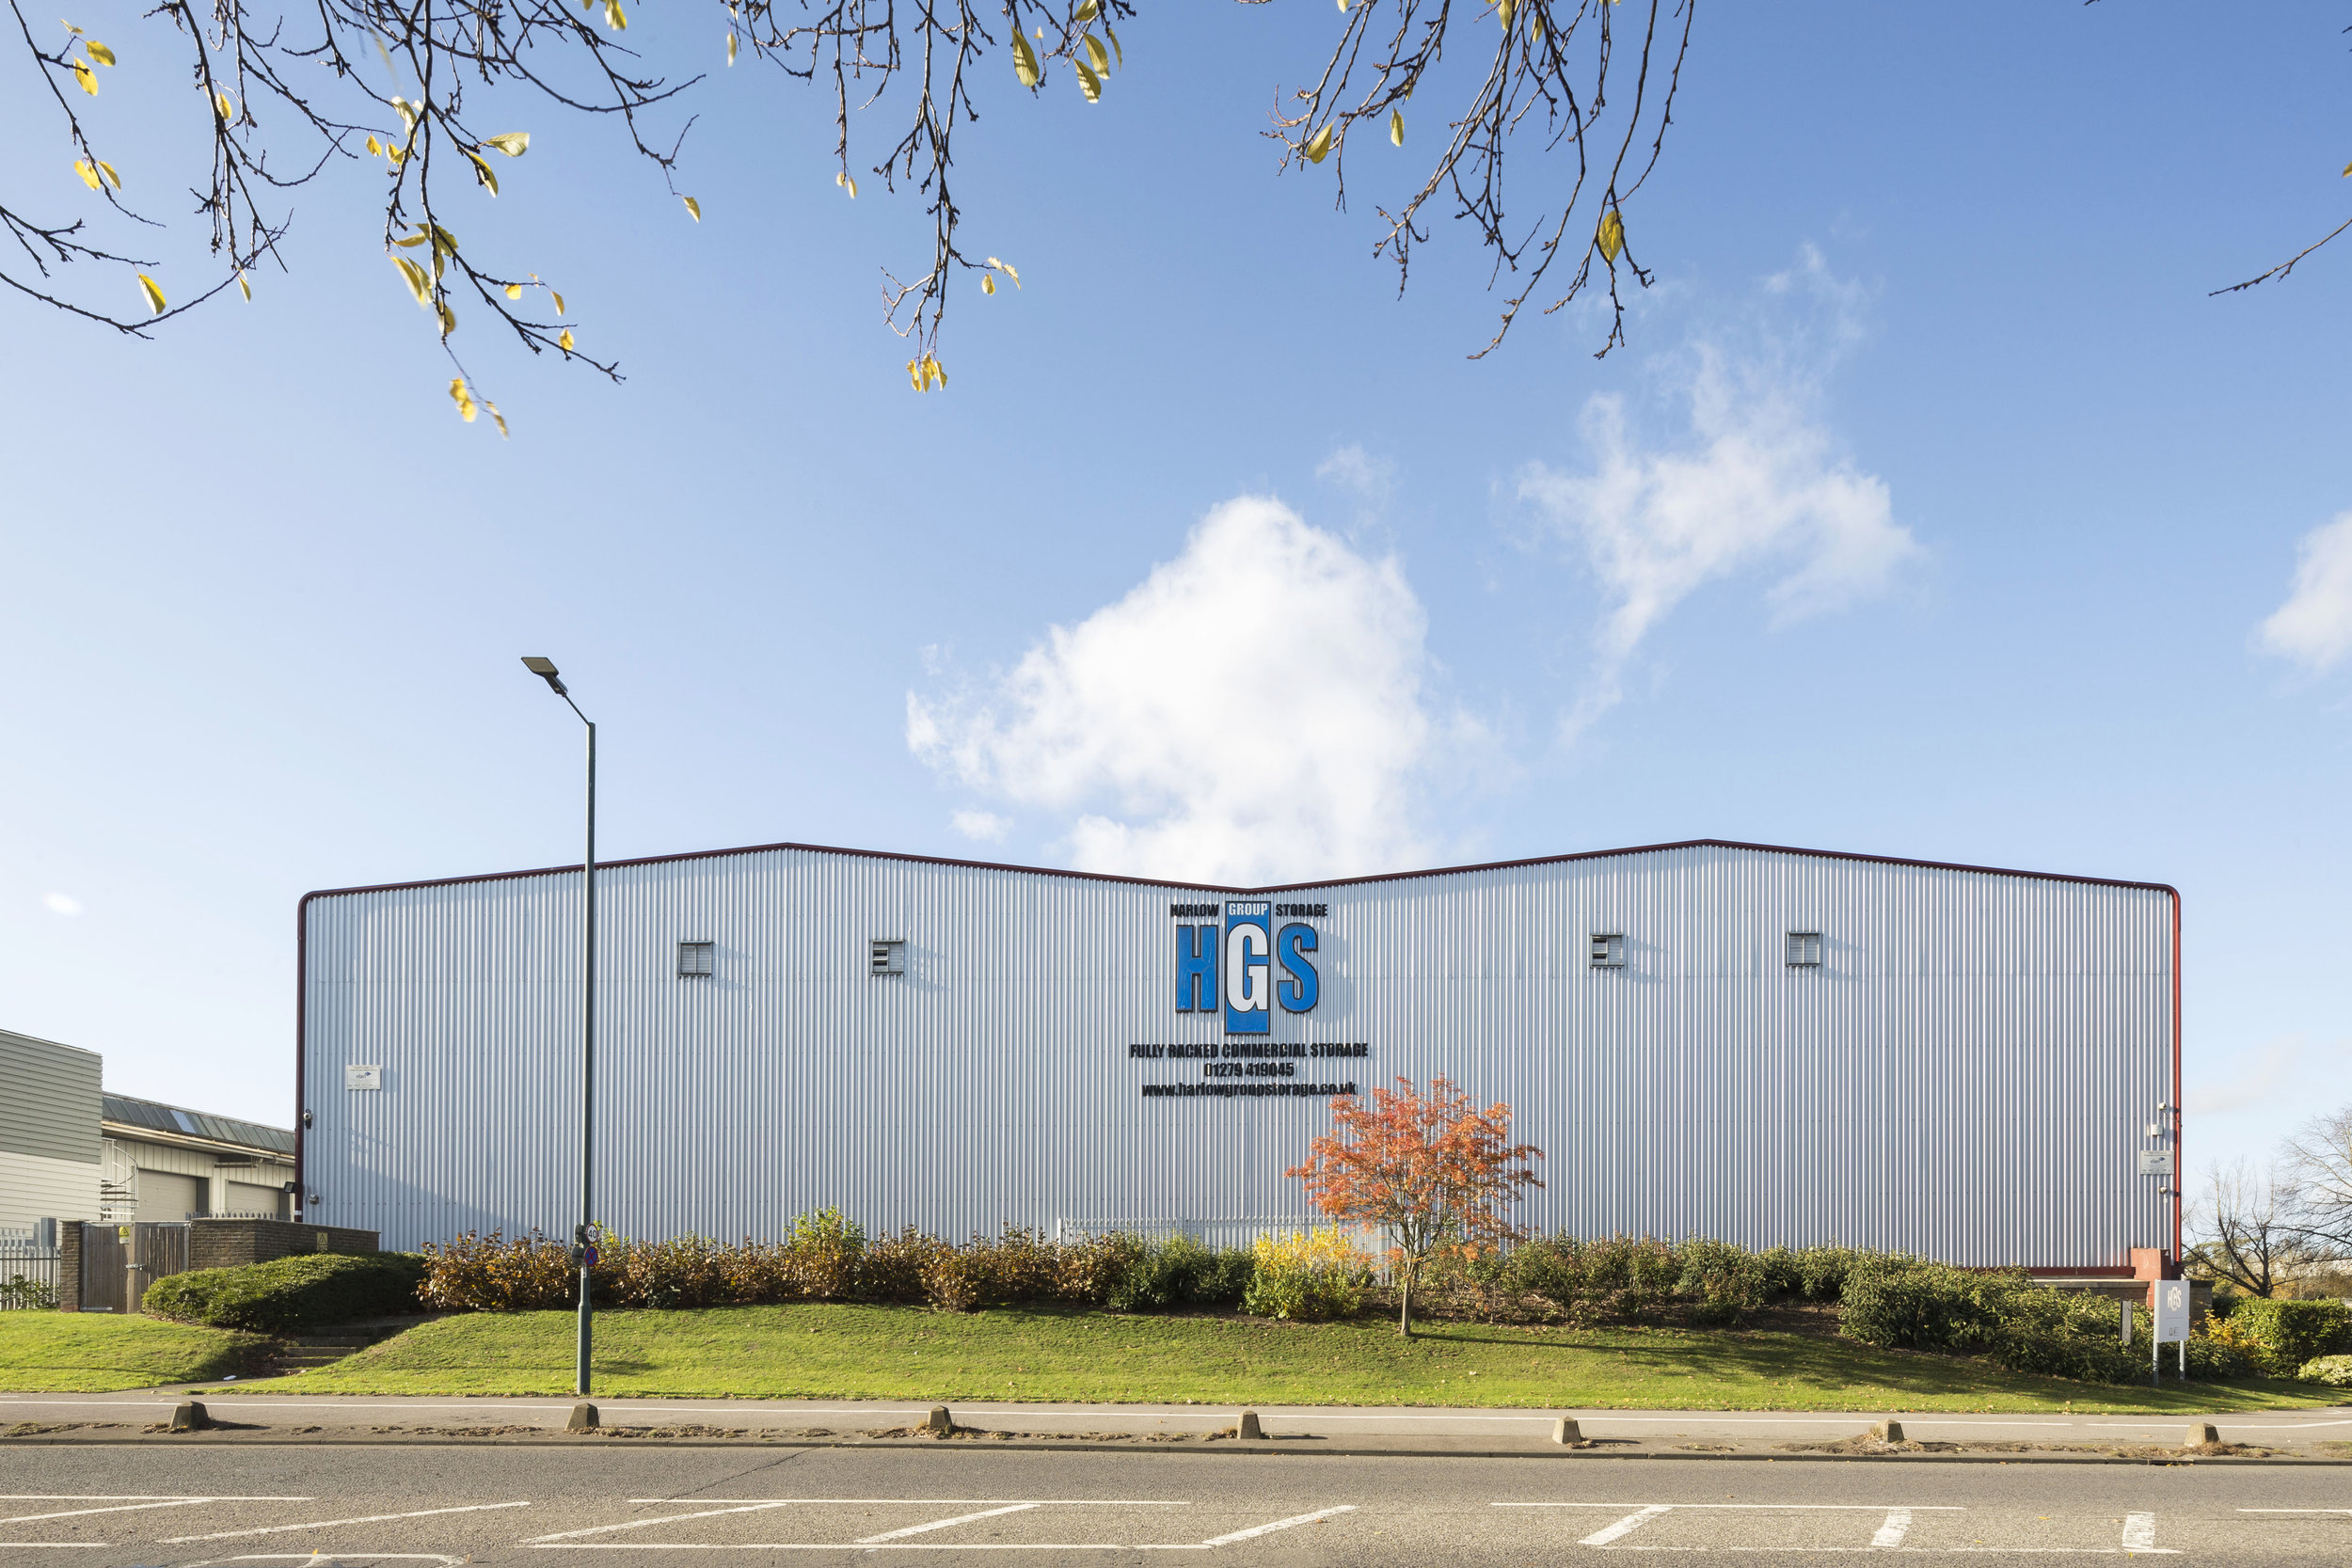 hgs_warehousing.jpg